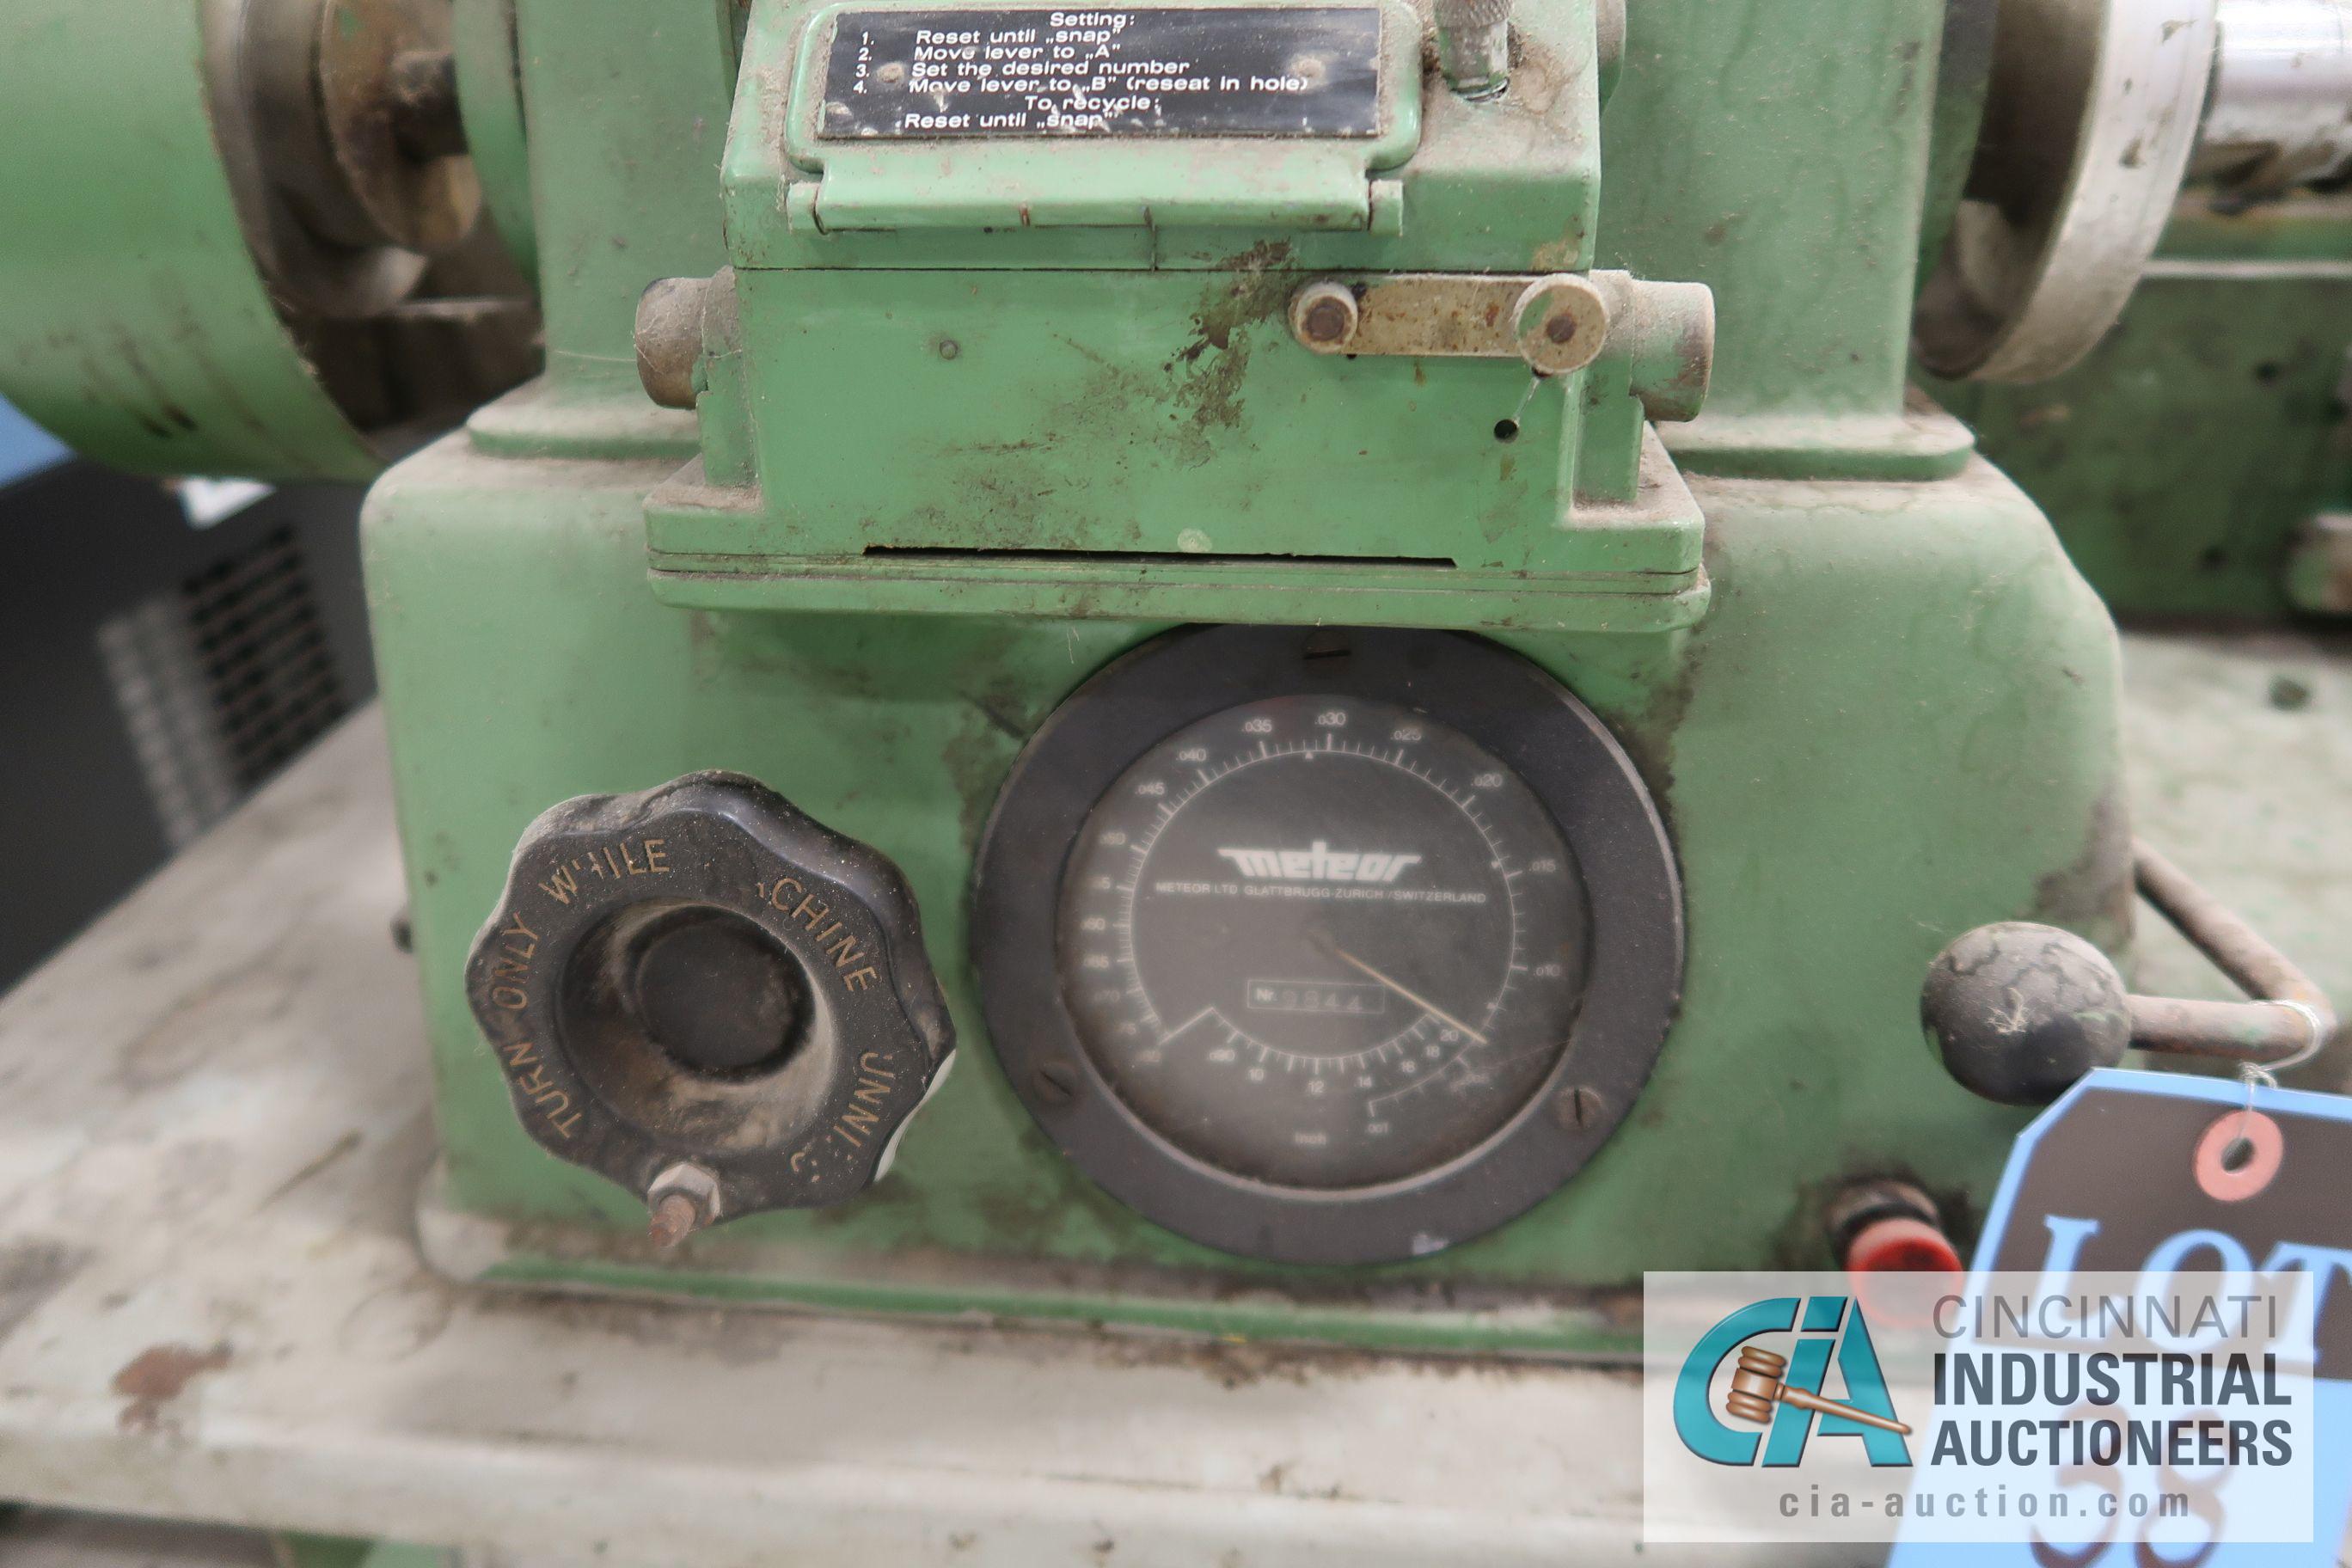 METEOR TYPE ME 301 BOBBIN WINDING MACHINE; S/N 9844 - Image 2 of 5